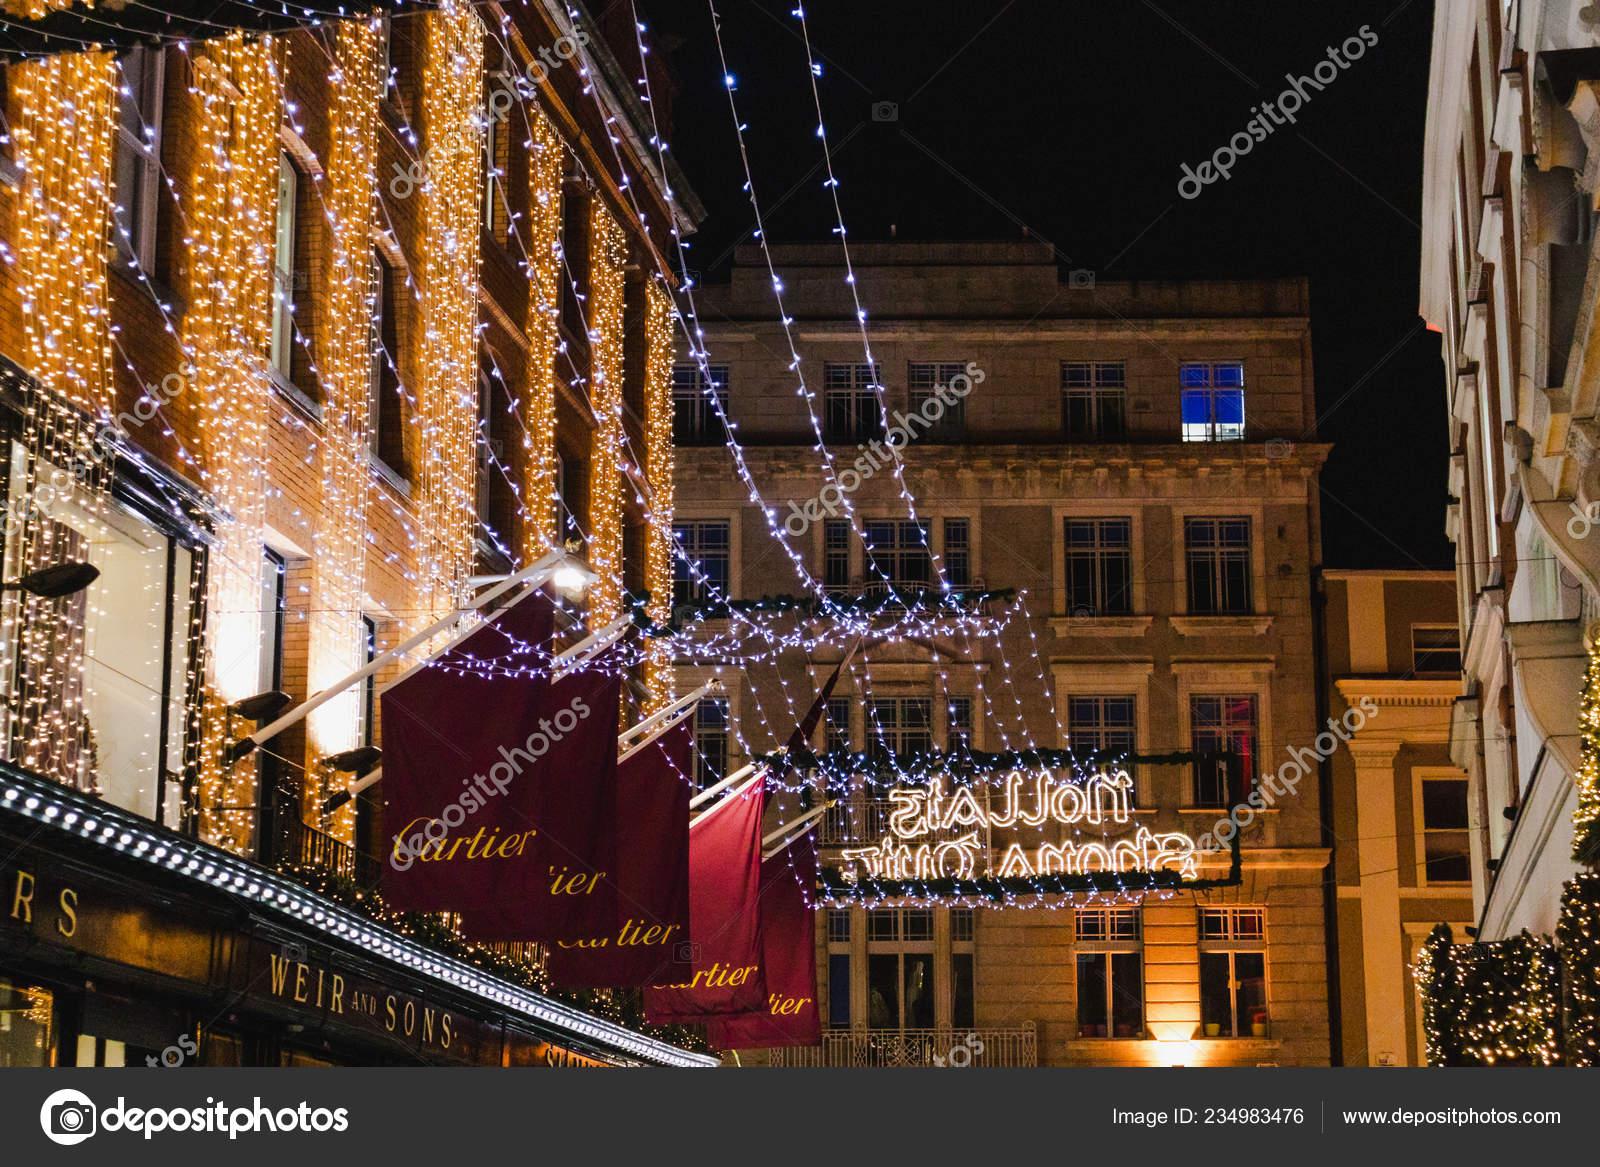 Christmas In Dublin Ireland.Dublin Ireland December 19th 2018 Christmas Decorations